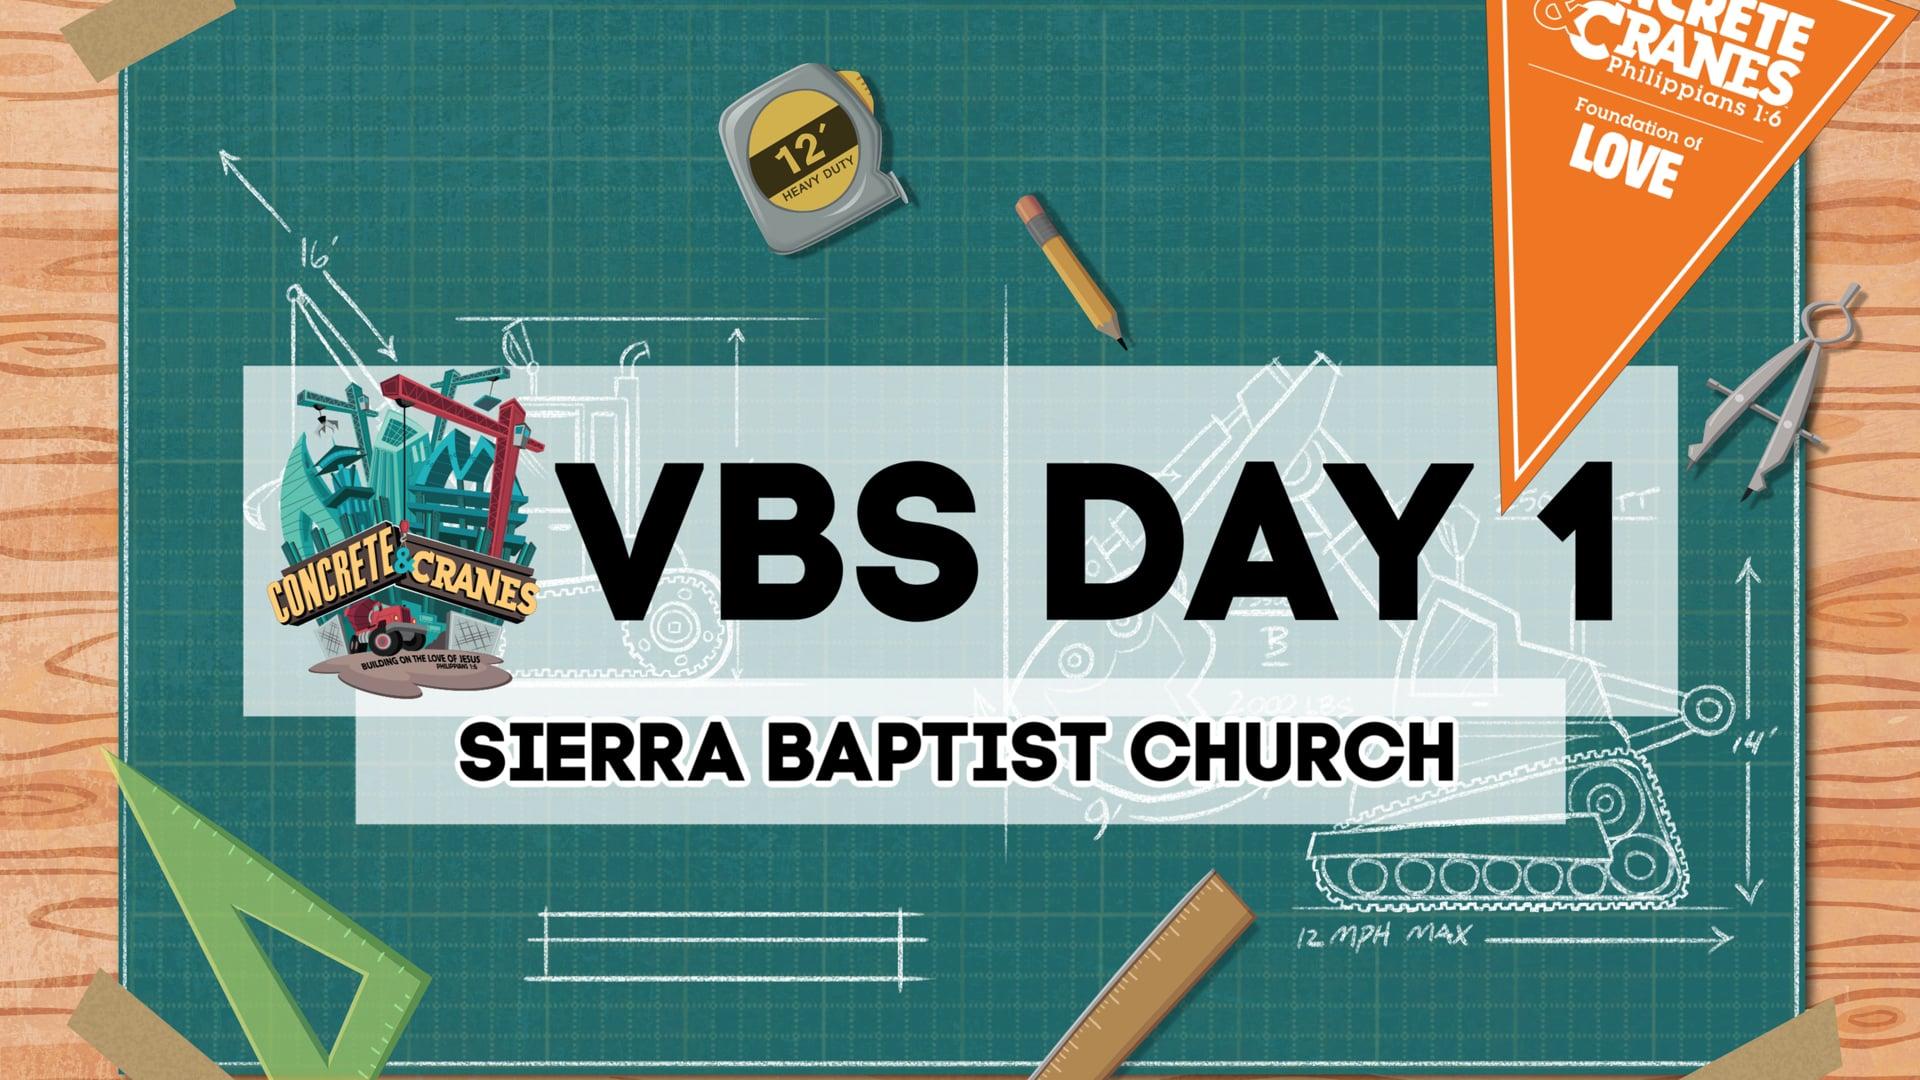 VBS Day 1 - Concrete & Cranes at Sierra Baptist Church